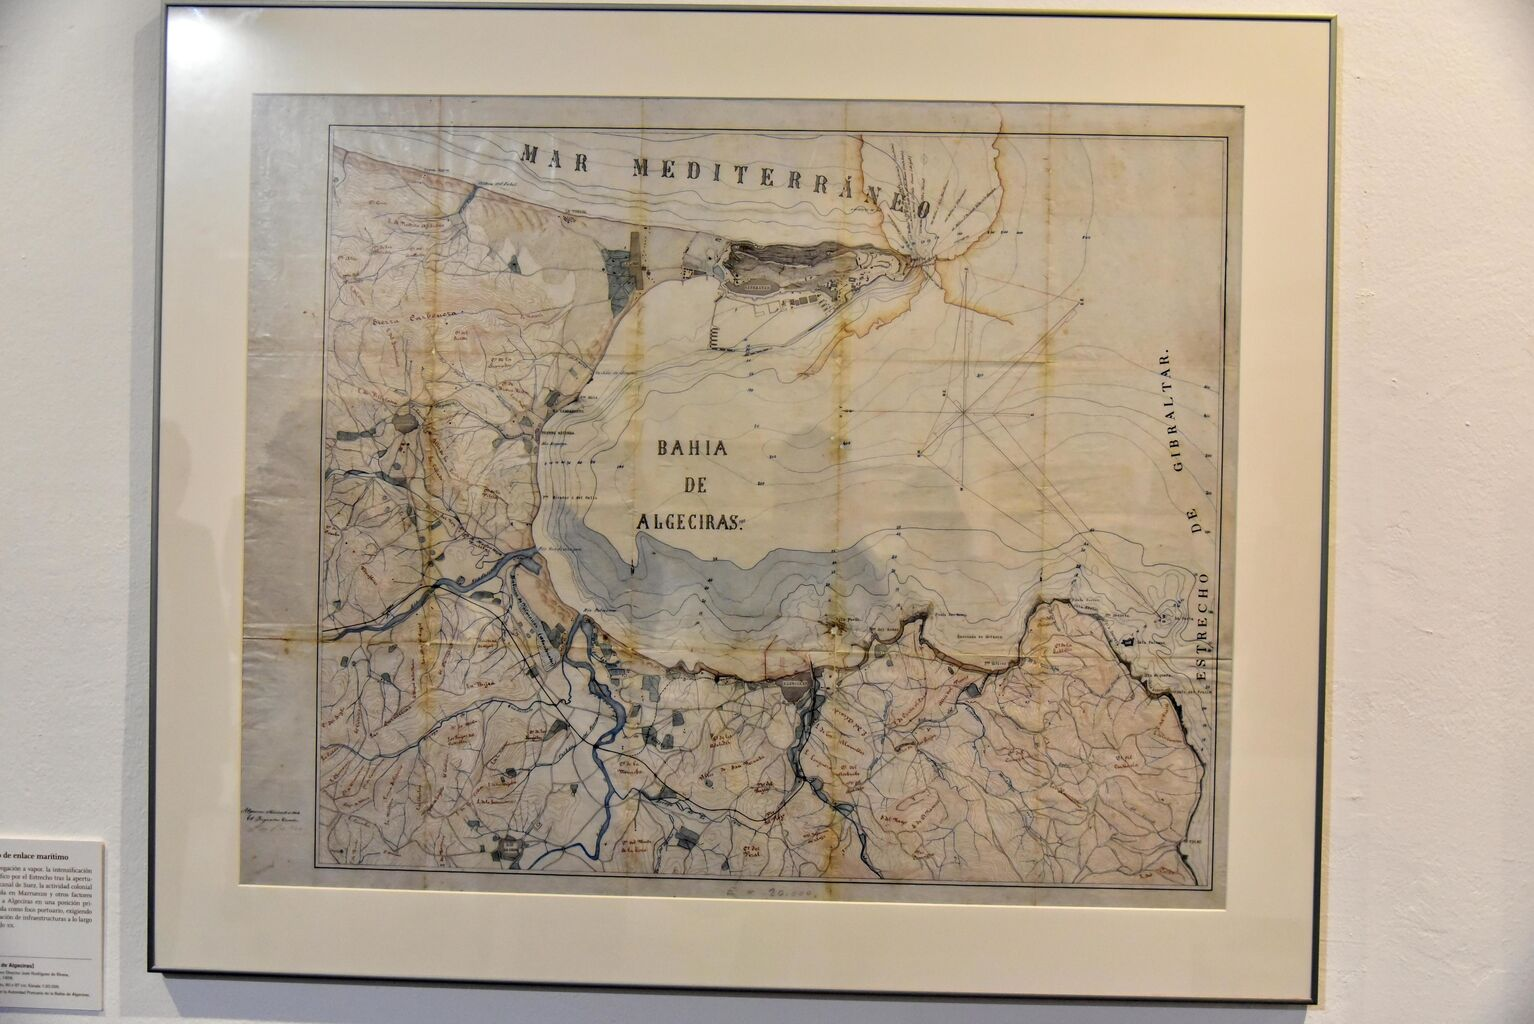 La Historia De Algeciras En Mapas